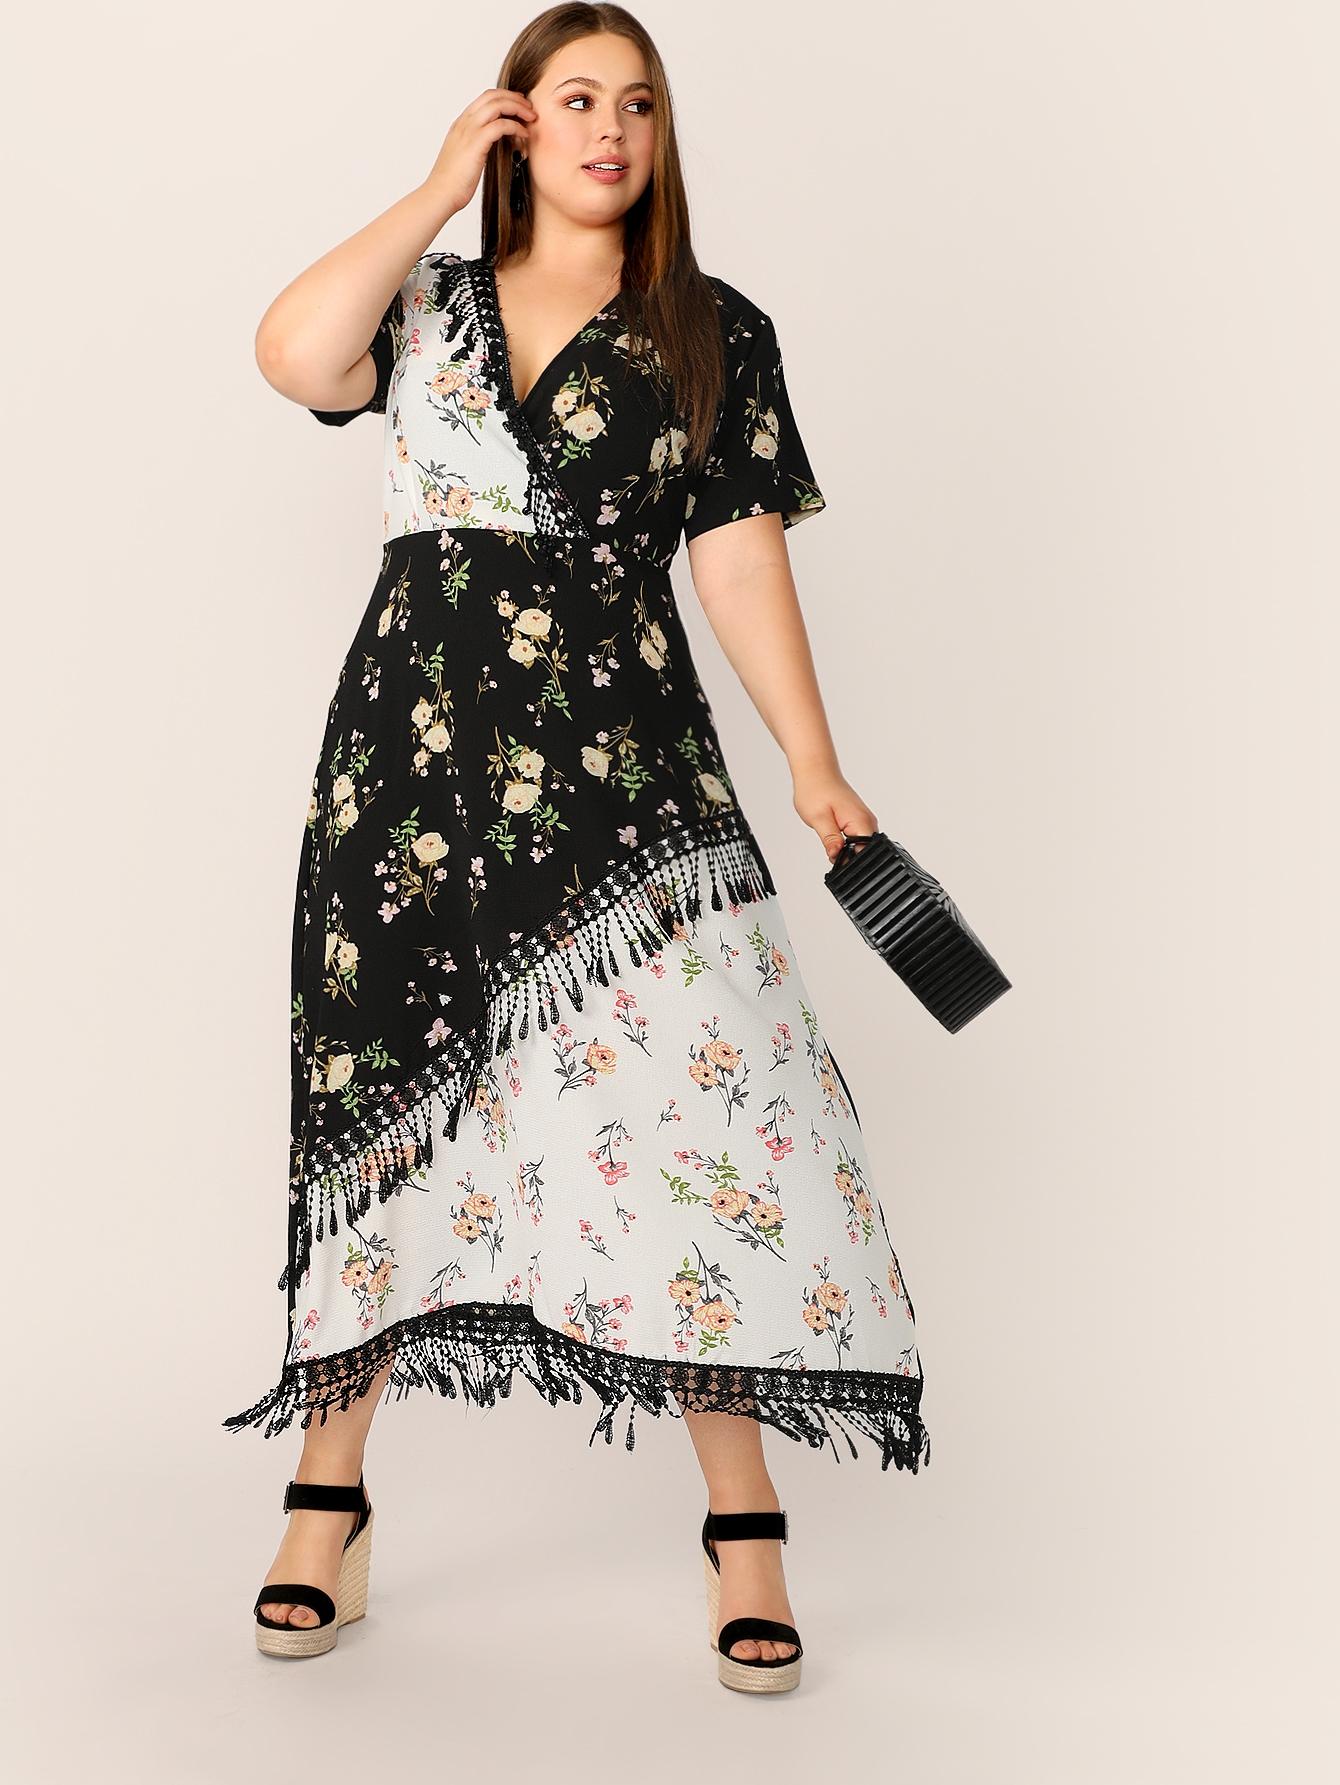 8c2483bd797 Plus Size Shapewear For Wedding Dresses Australia